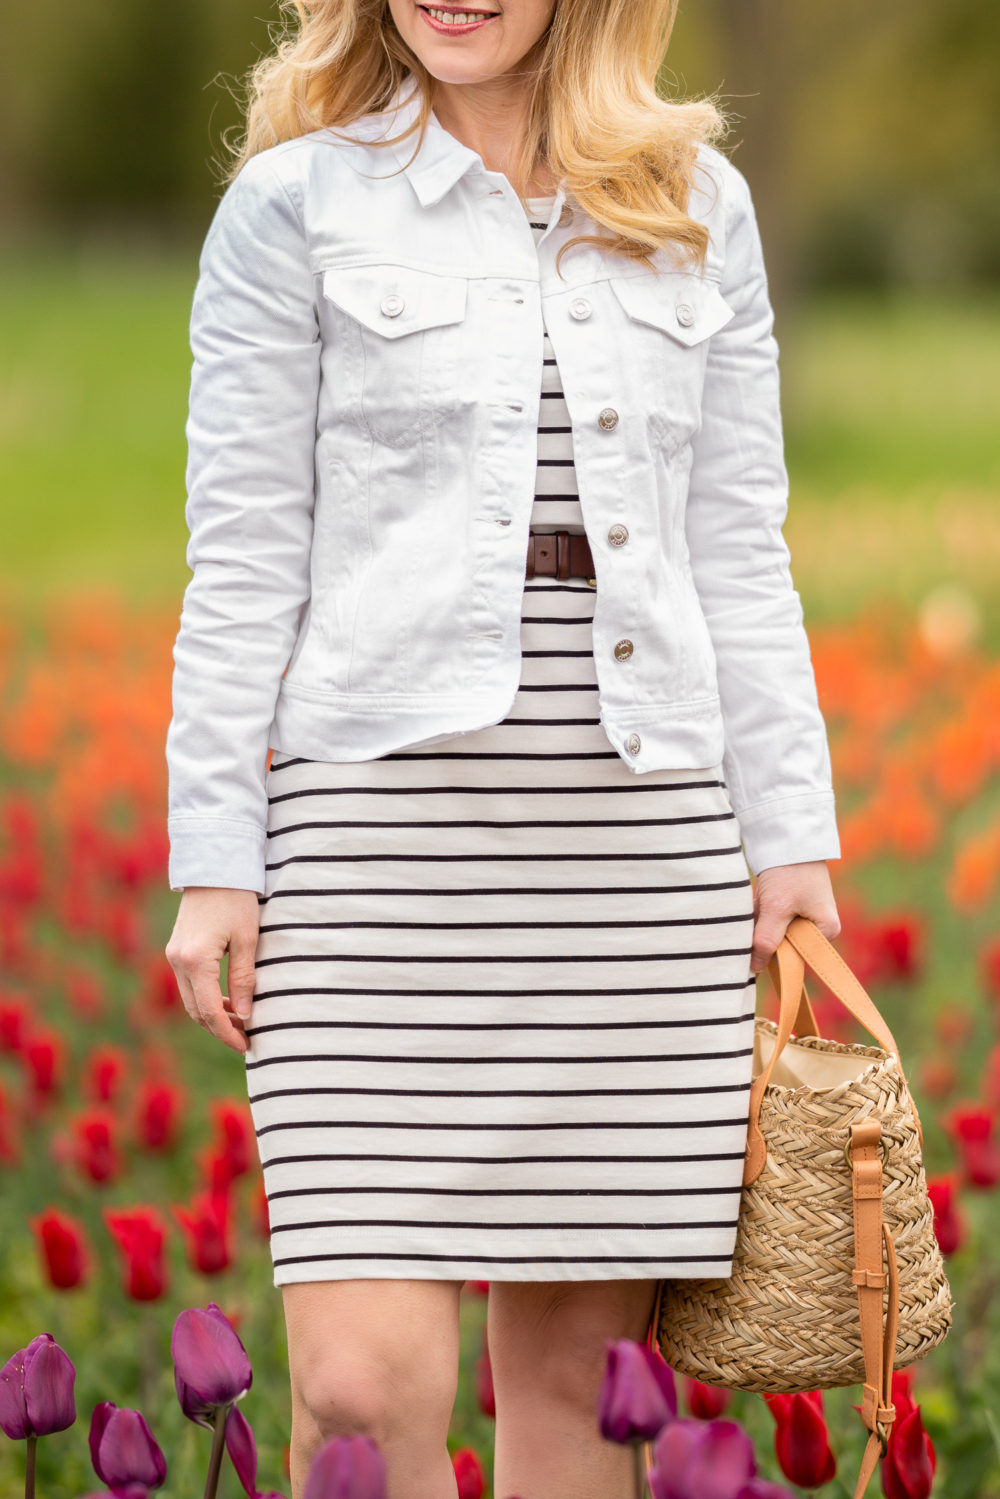 Petite Fashion Blog | Holland Michigan Tulip Time Festival |Holland Tulip Time | Tulip Festival | Tulip Fields | J. Crew Factory Striped Dress | J. Crew White Denim Jacket